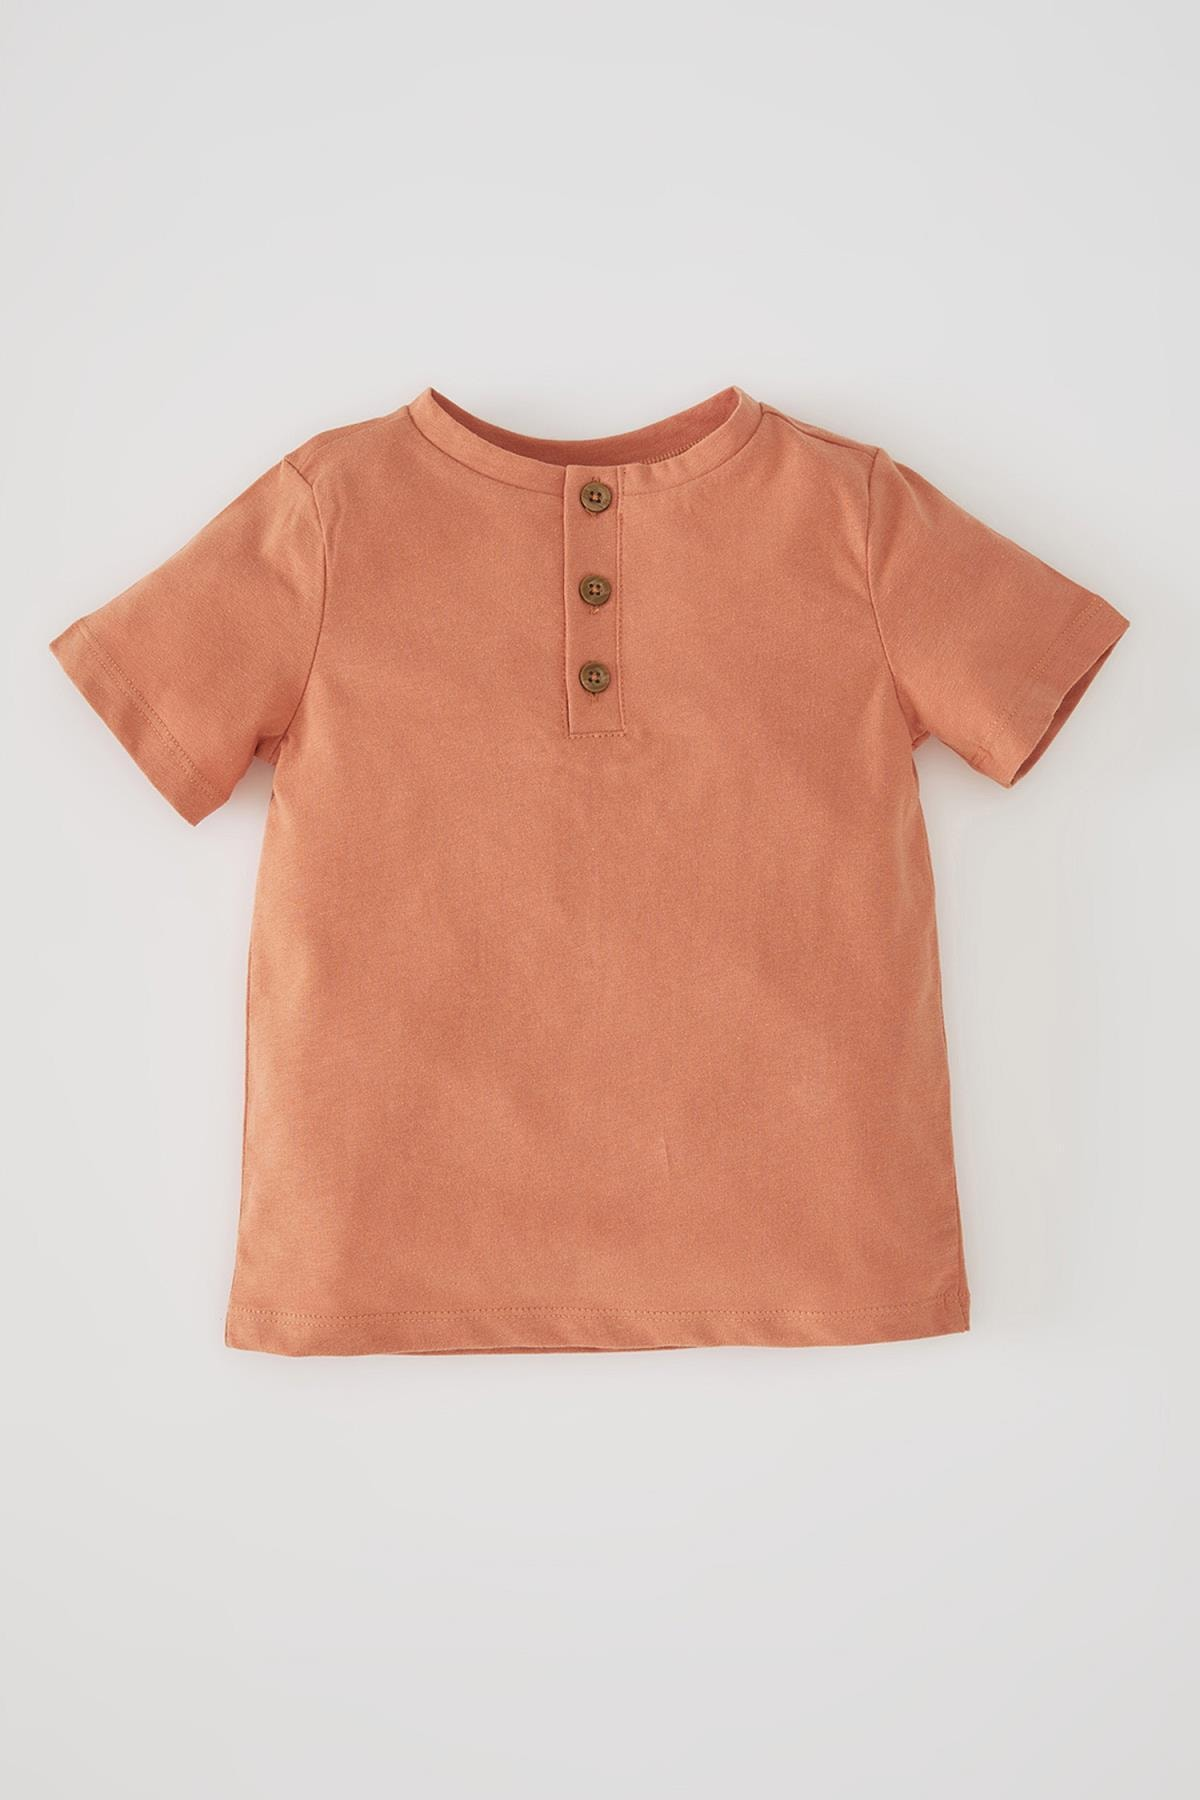 Unisex Kısa Kollu Pamuklu Tişört